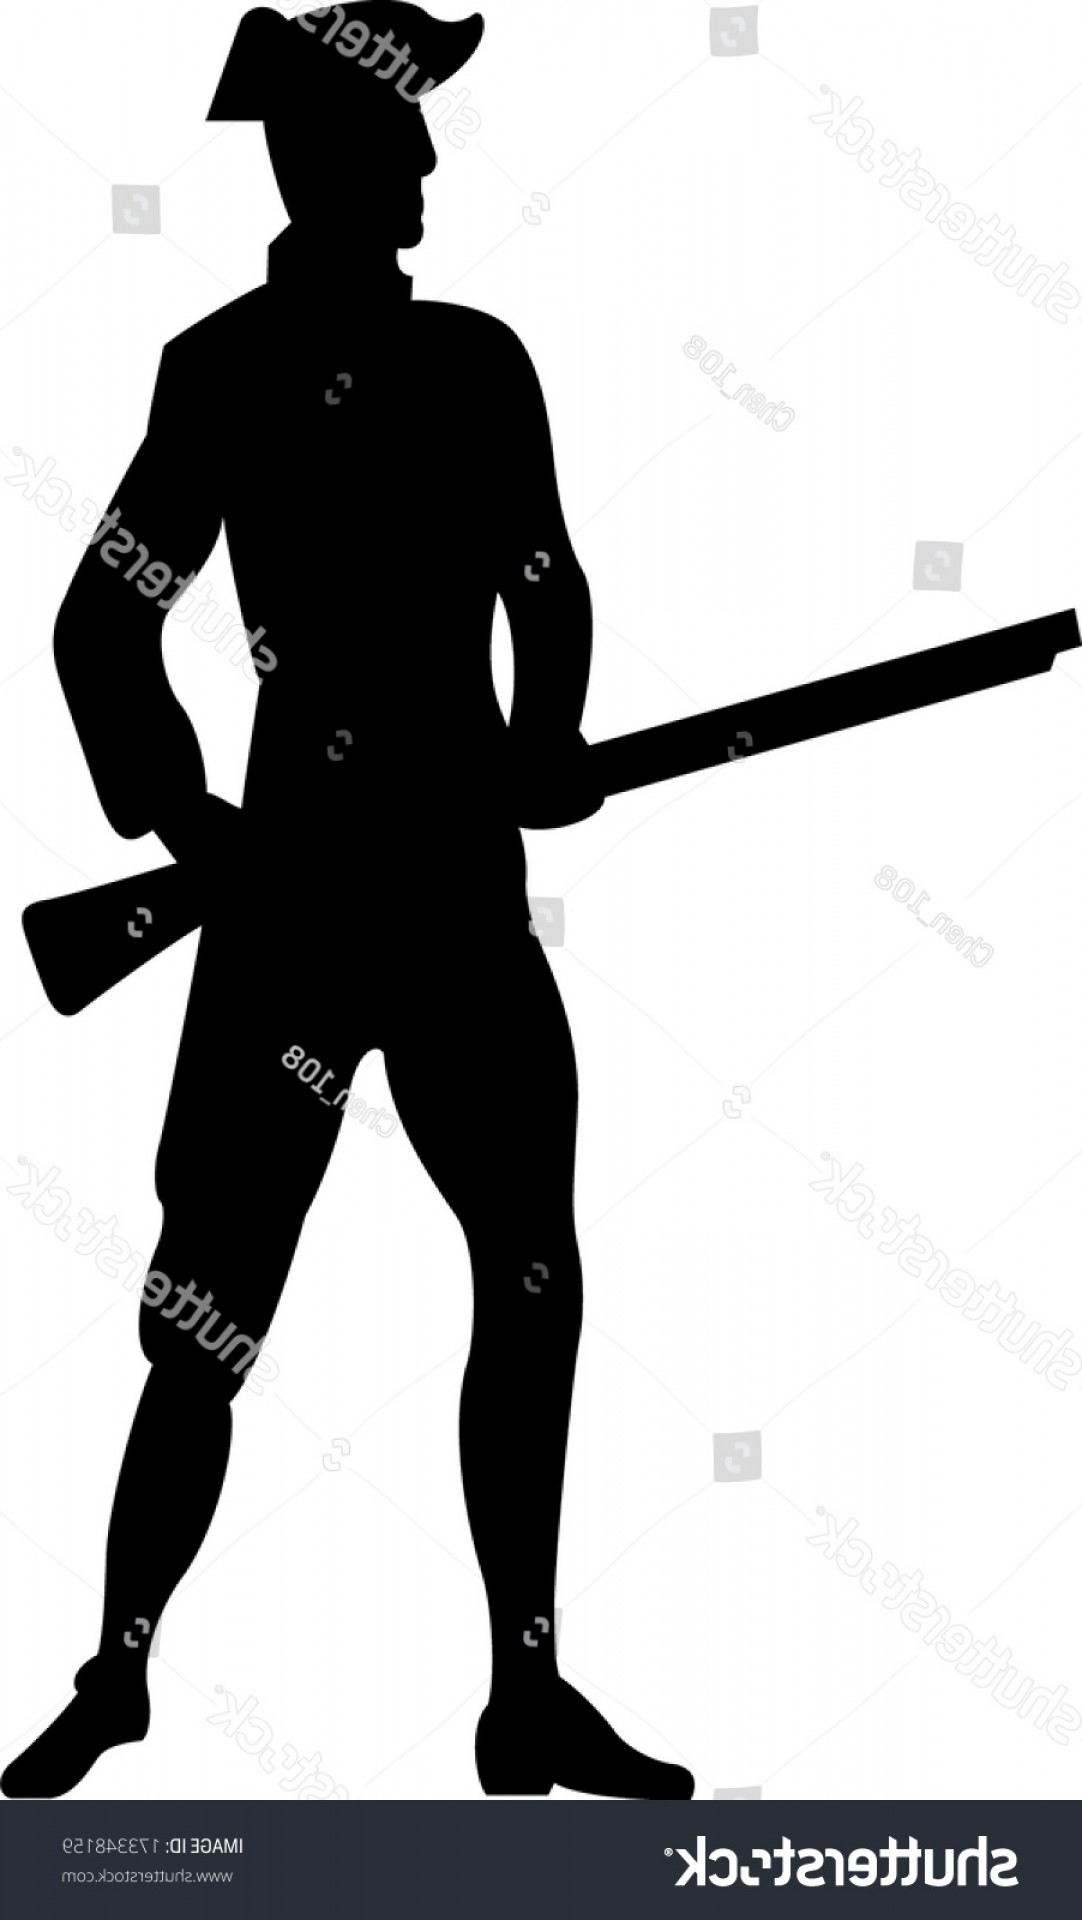 1082x1920 American Revolutionary War Soldier Silhouette Sohadacouri